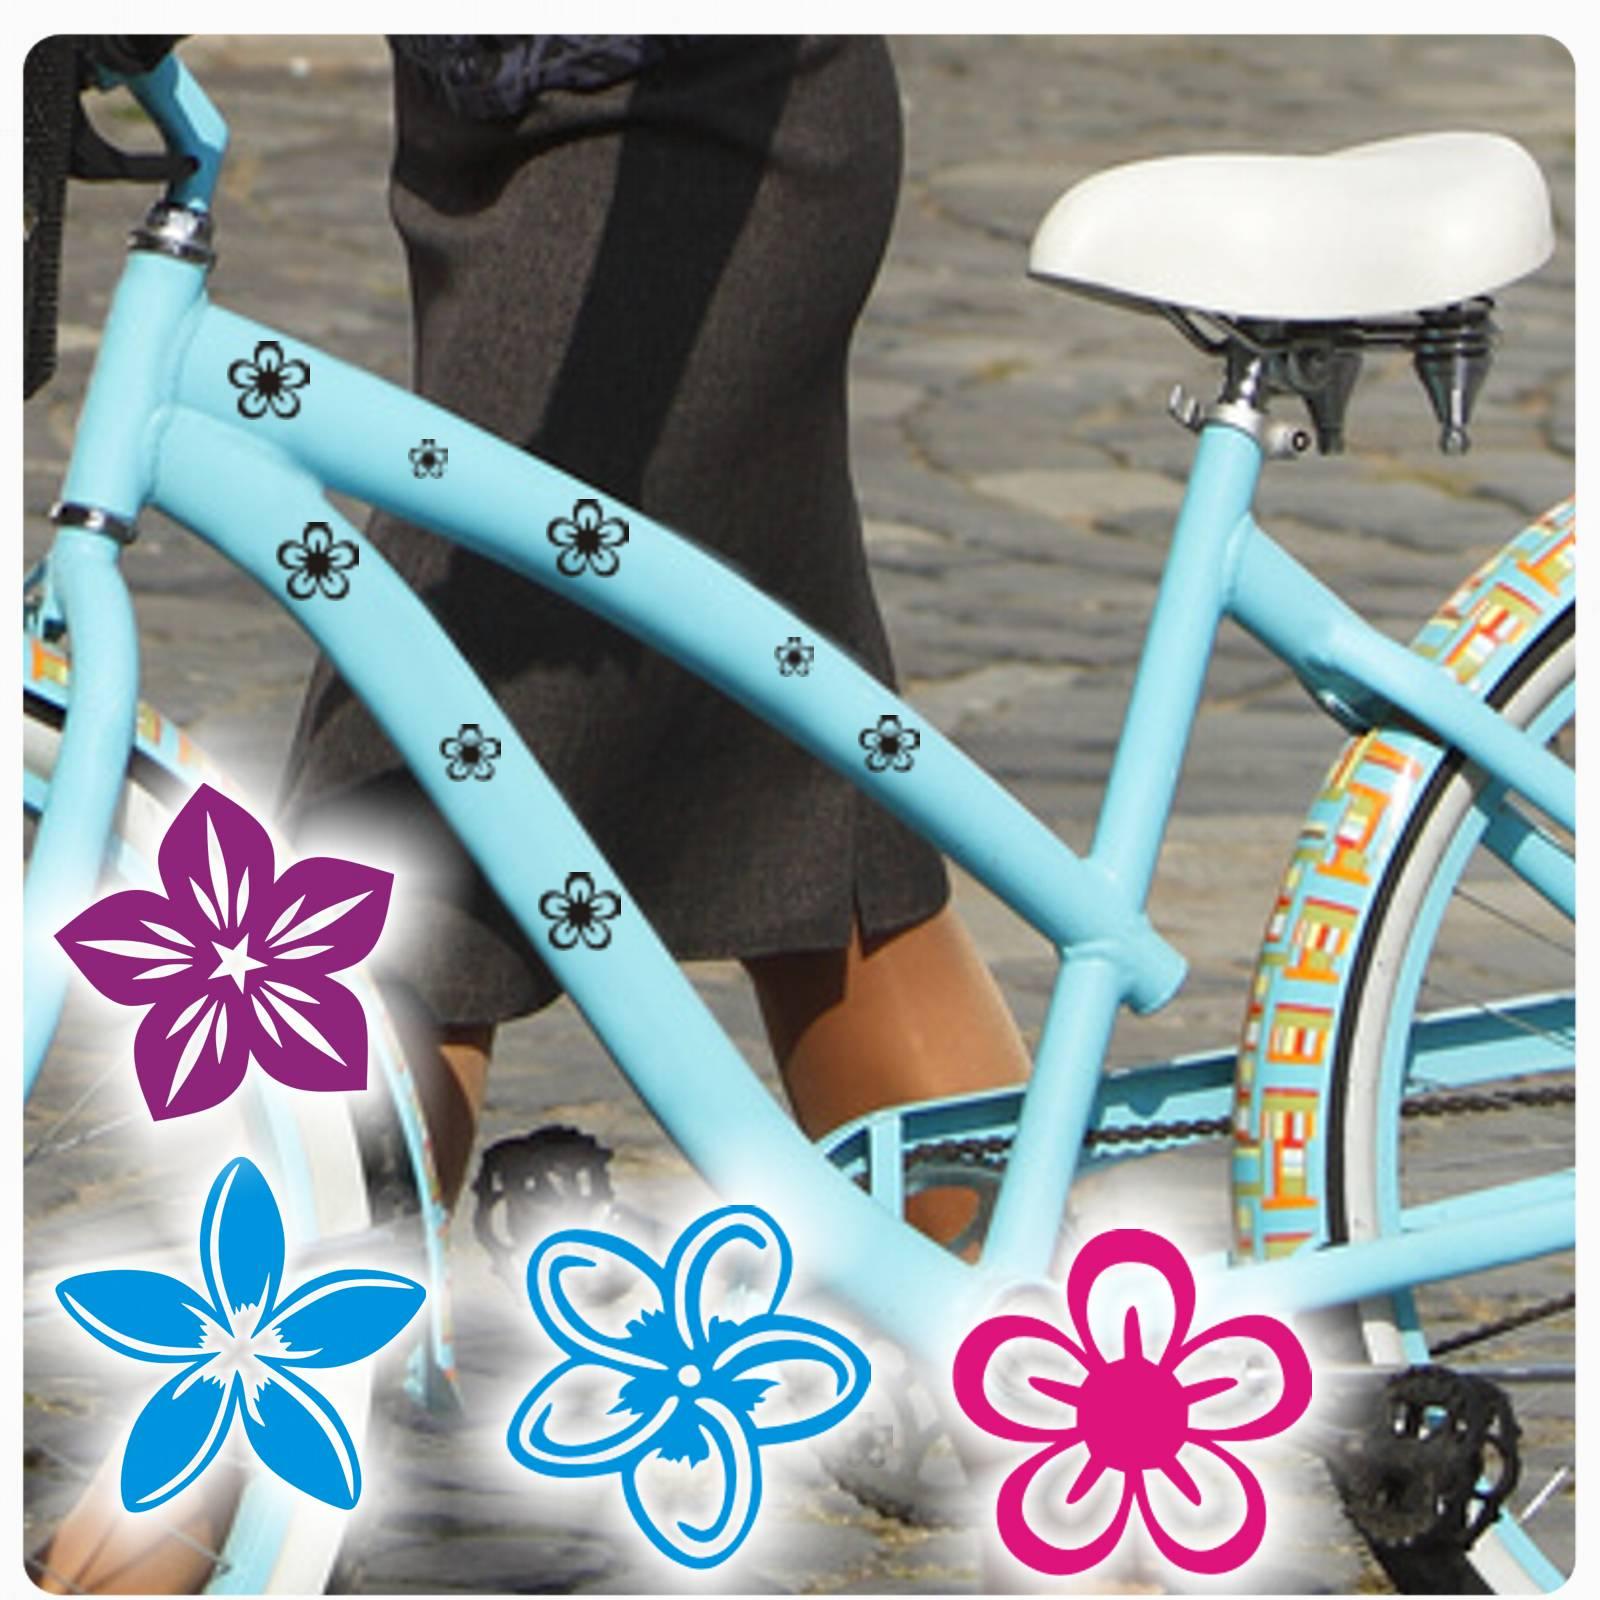 blumen bl ten fahrradaufkleber fahrrad aufkleber sticker hibiskus hawaii f002 ebay. Black Bedroom Furniture Sets. Home Design Ideas